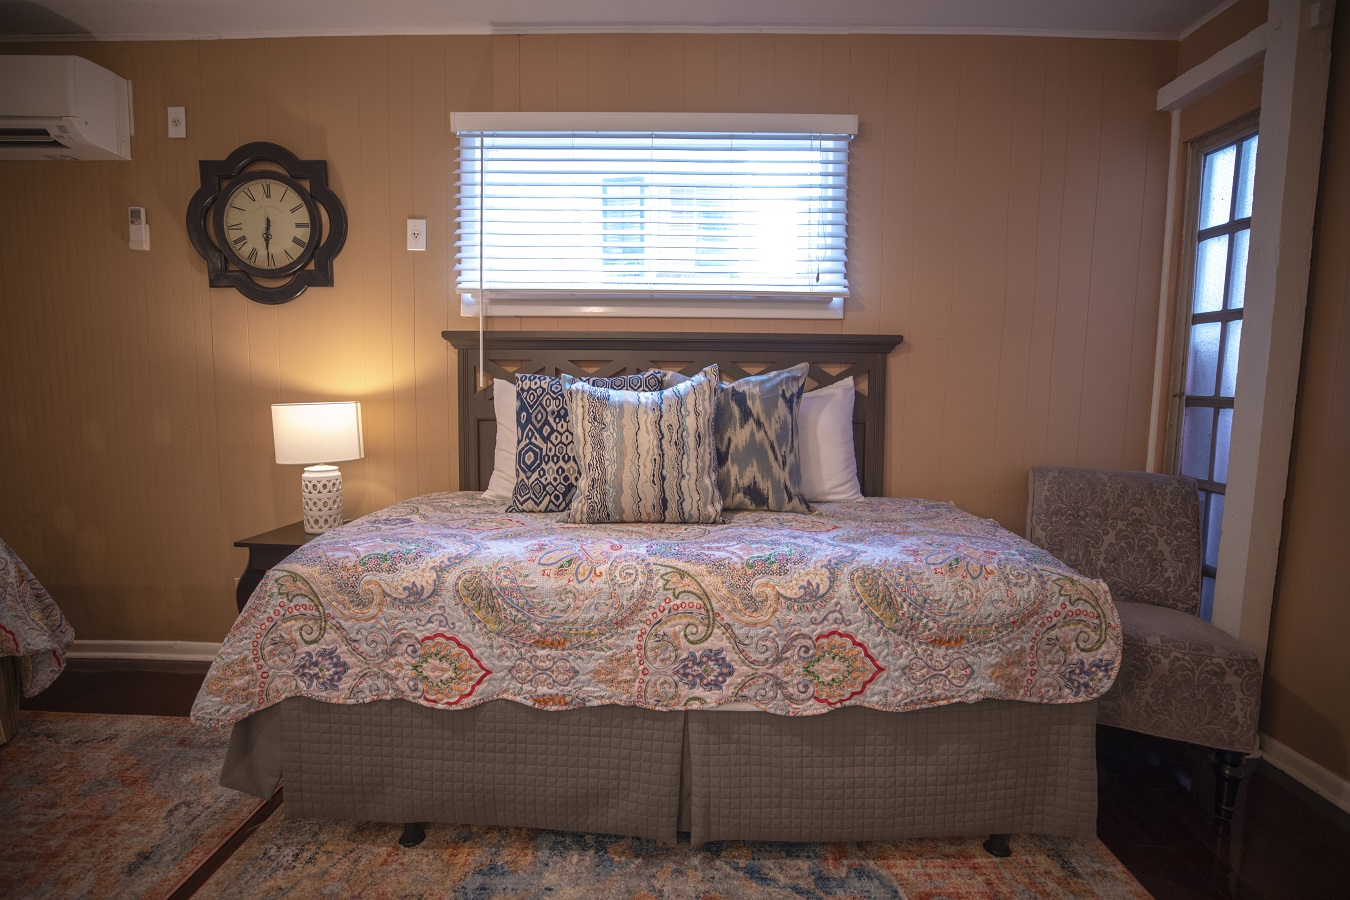 Key West Vacation Rental - William Skelton Home - Cottage Queen + Twin Bedroom